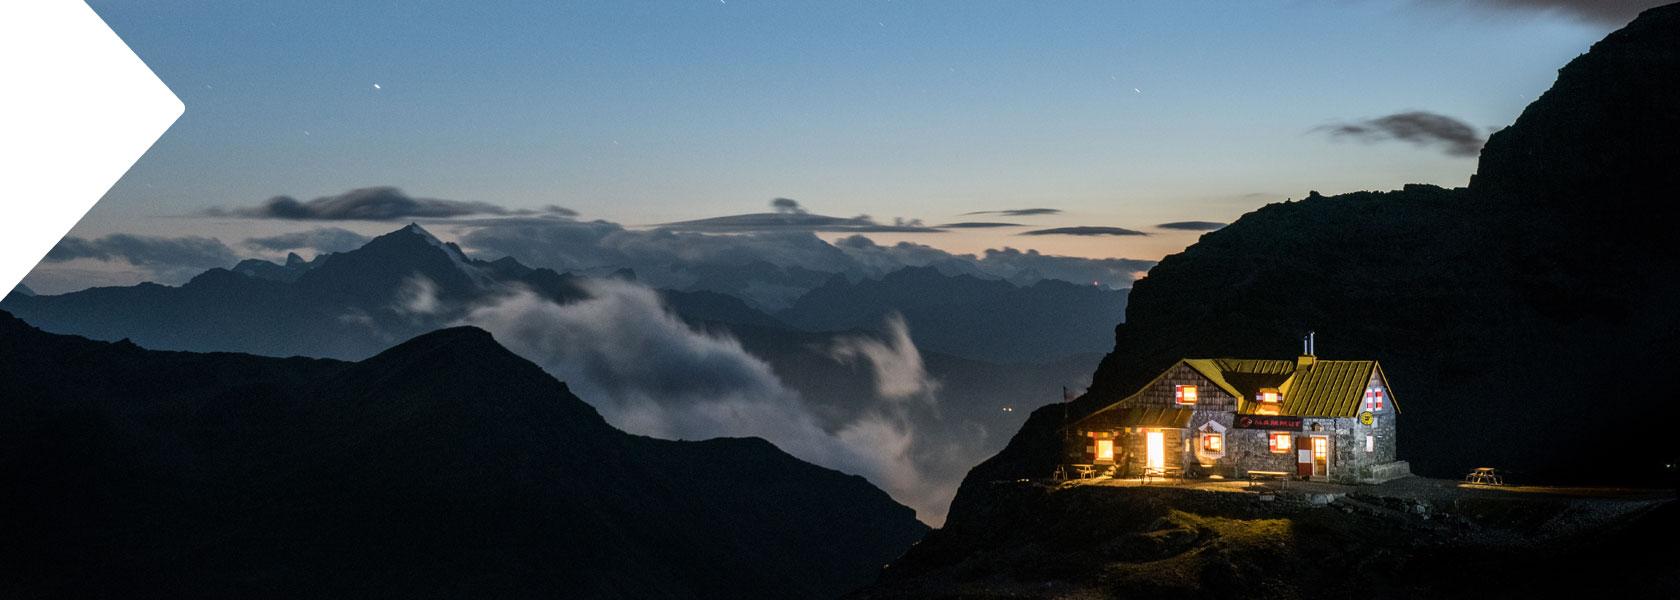 notte-stellata-montagna-lombardia-rifugio